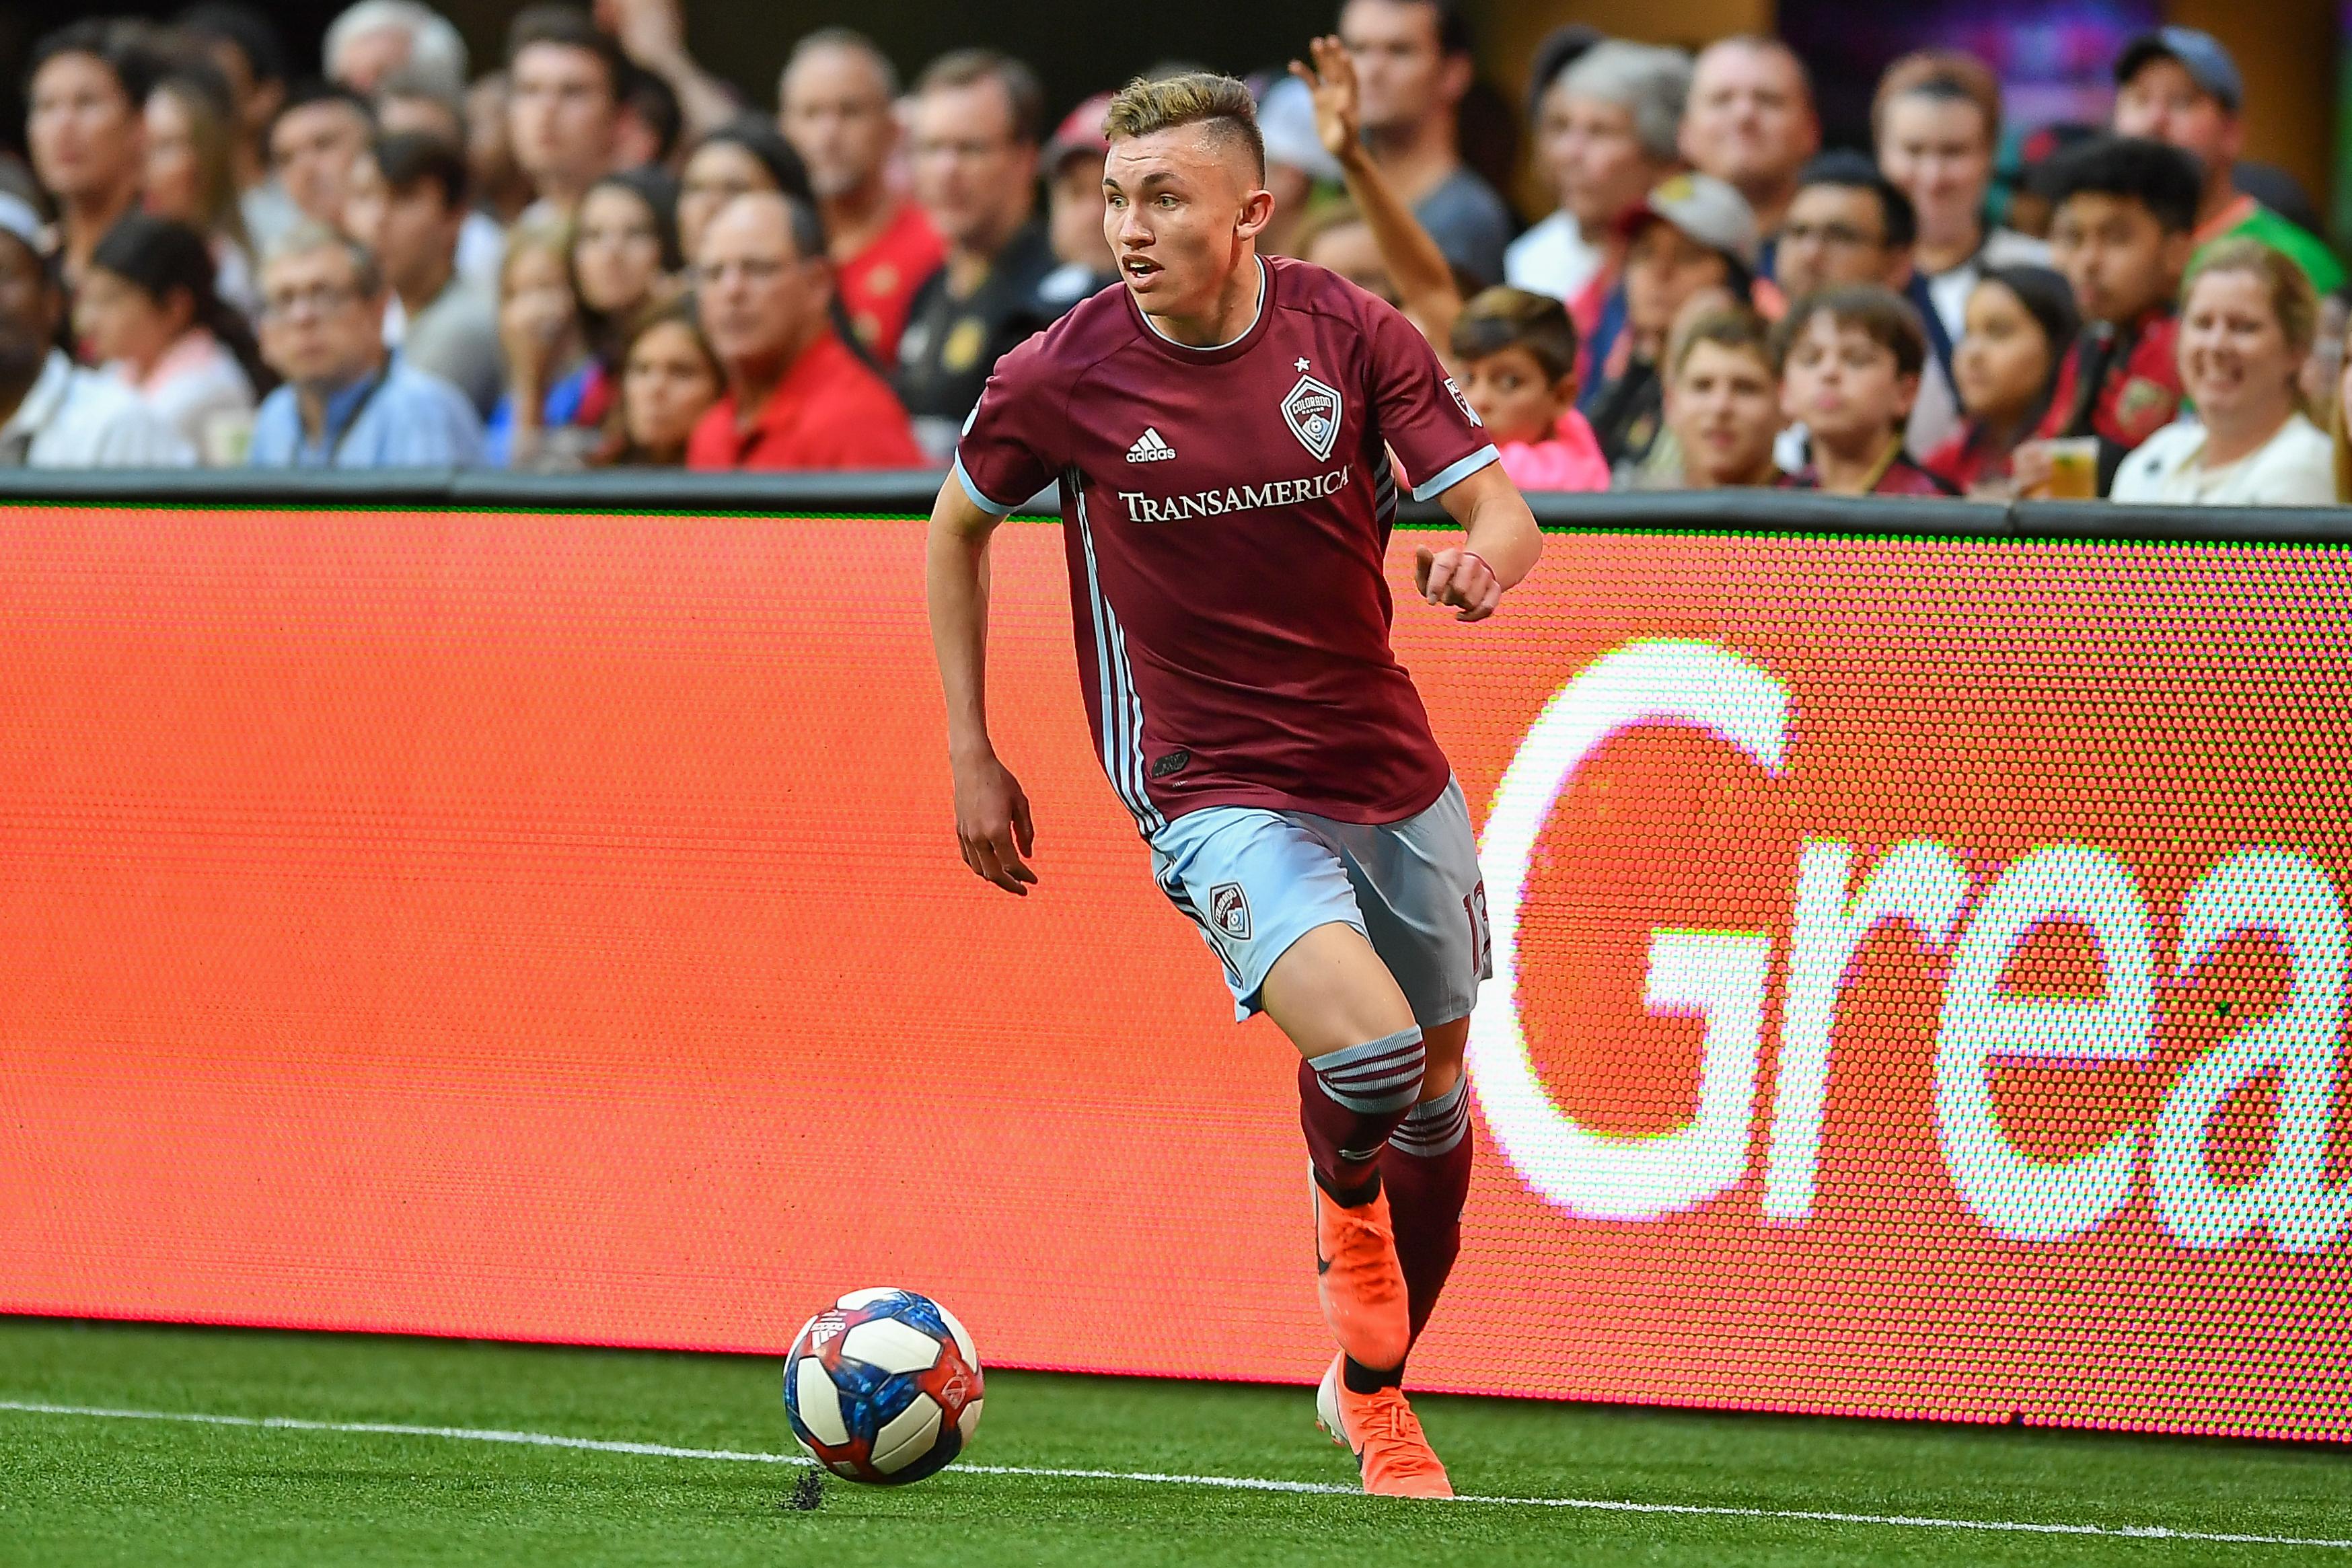 SOCCER: APR 27 MLS - Colorado Rapids at Atlanta United FC